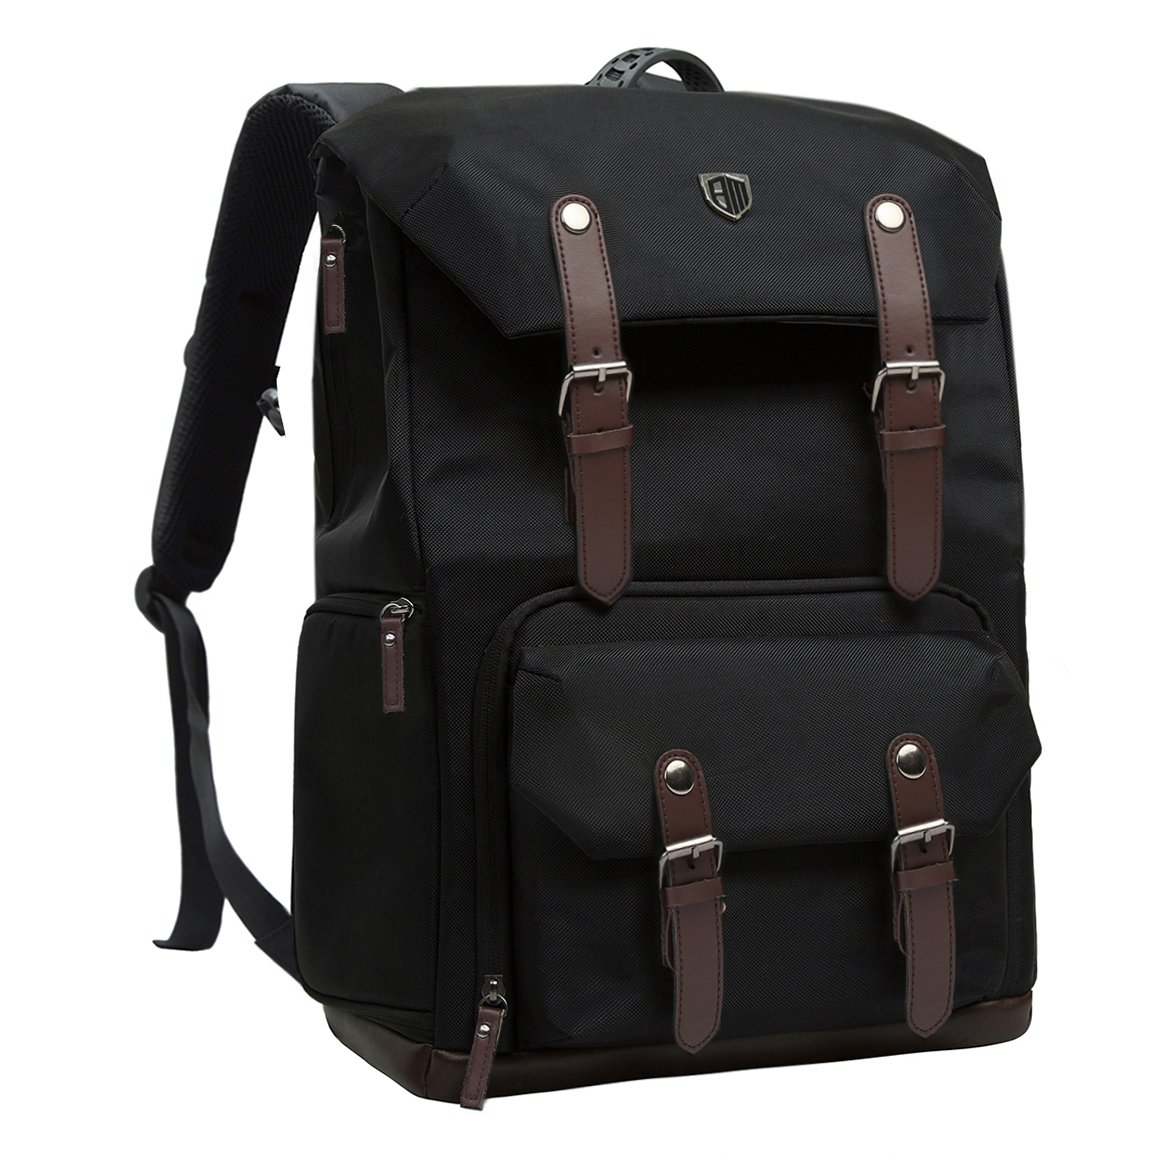 BAGSMART Camera Backpack for SLR/DSLR Cameras & 15'' Macbook Pro with Waterproof Rain cover, Black by BAGSMART